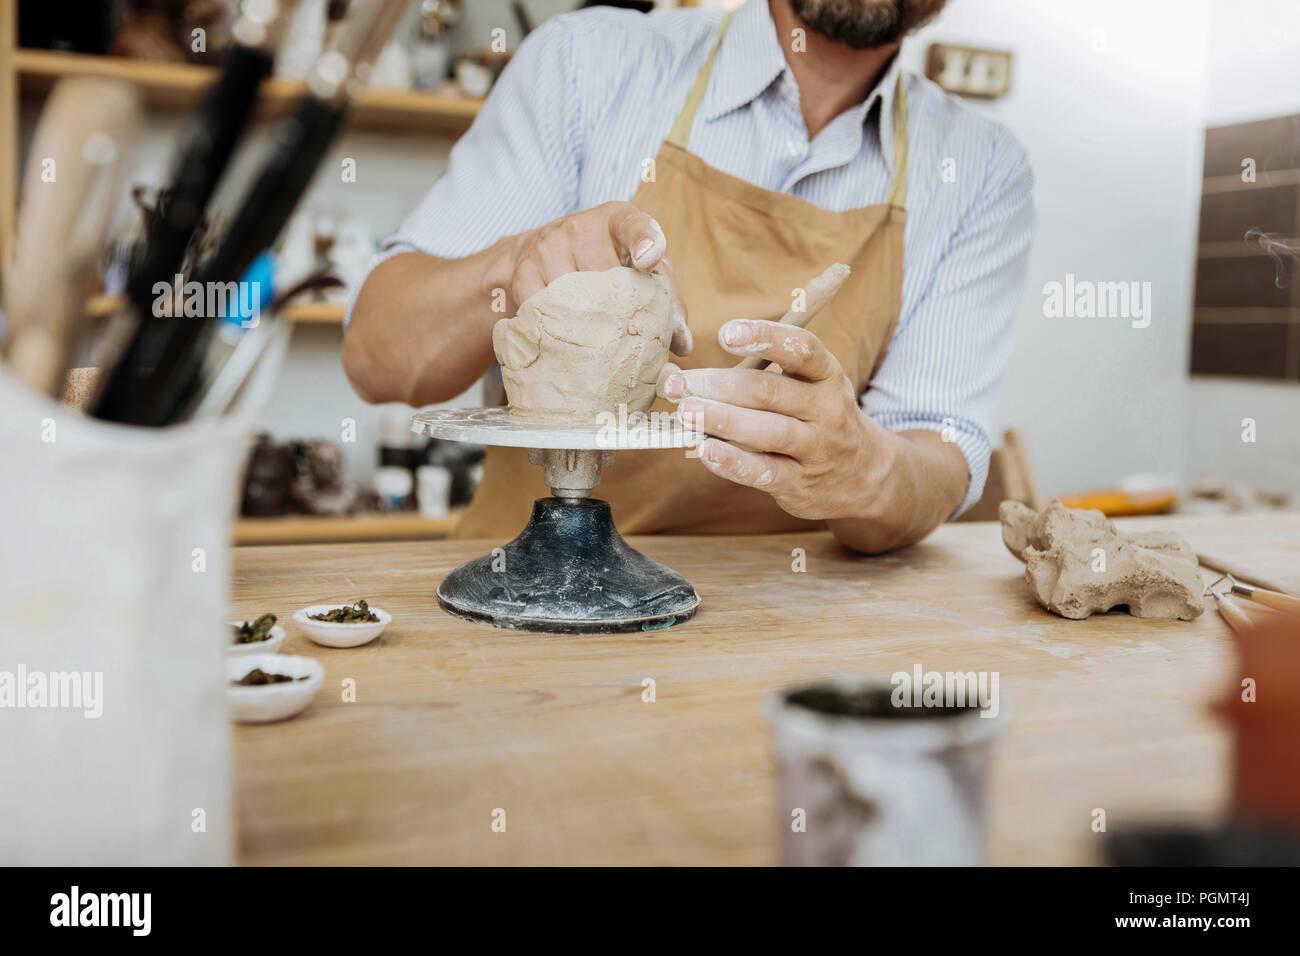 Bearded ceramist having creative ideas while using ceramics jigger - Stock Image